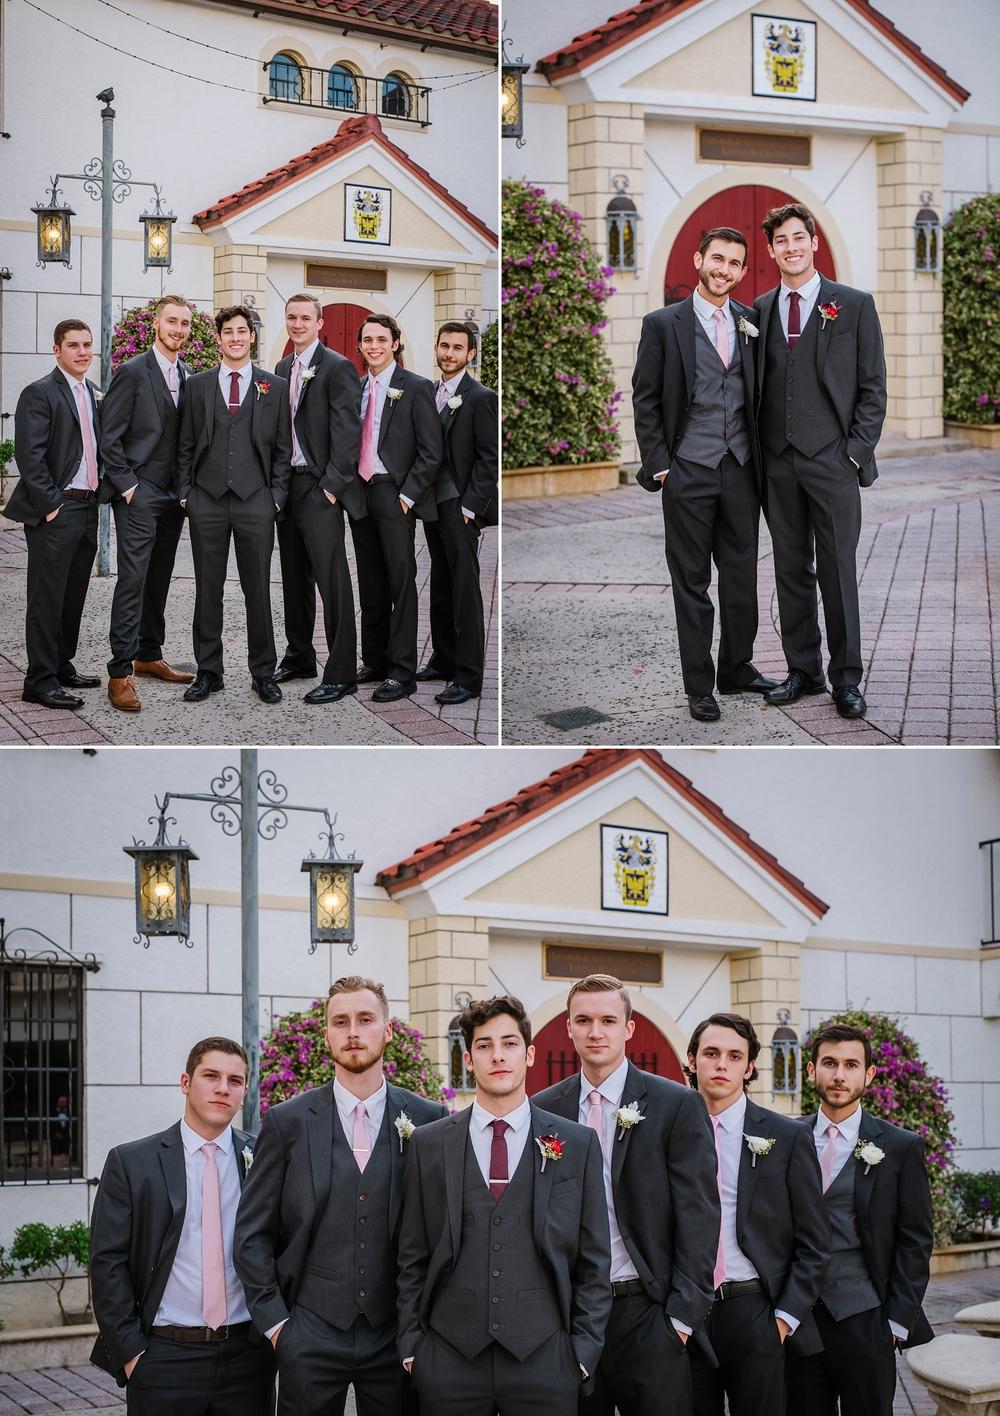 south-florida-museum-wedding-photography-bradenton_0009.jpg